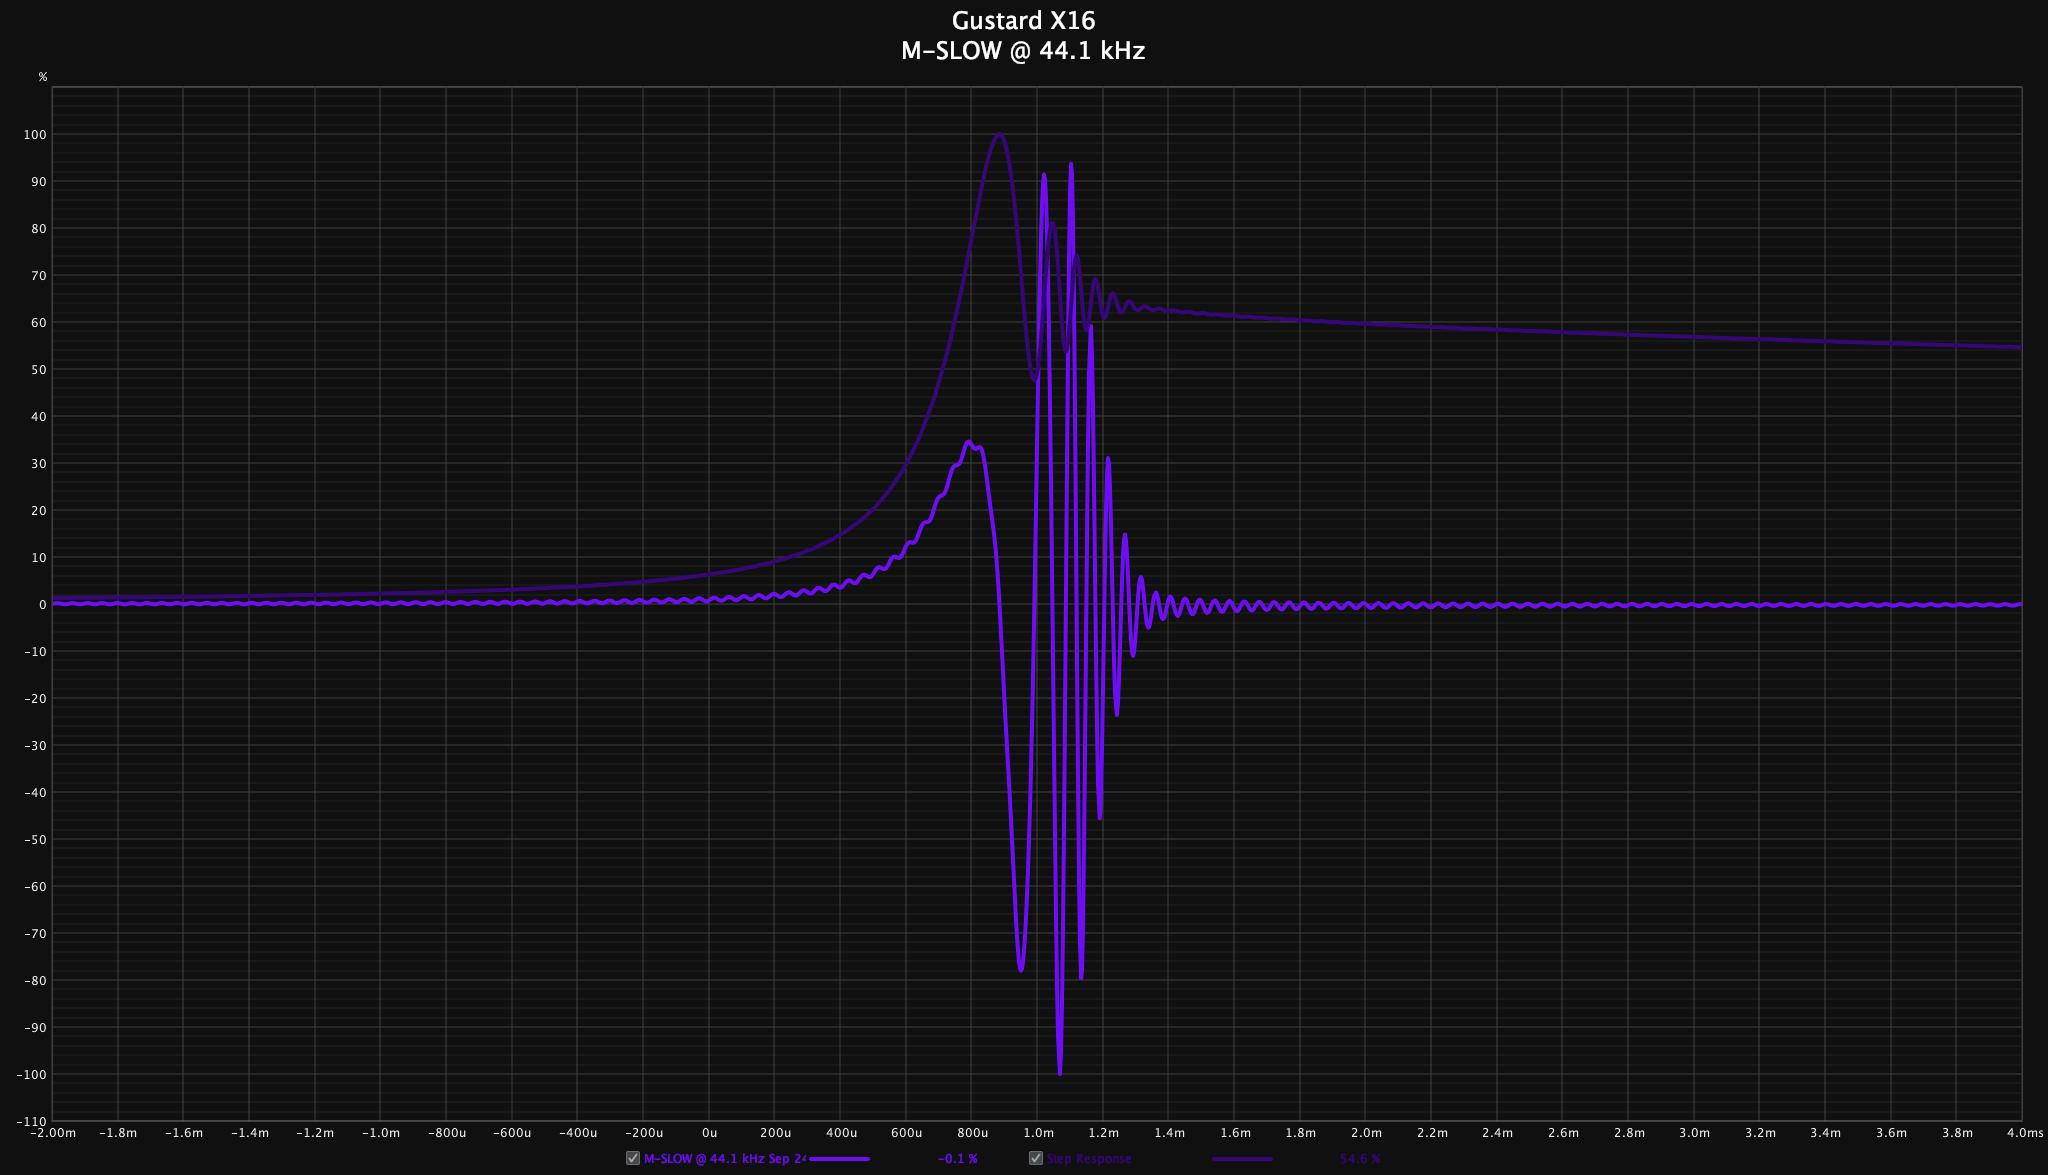 Gustard X16 - M-Slow 44.1.png